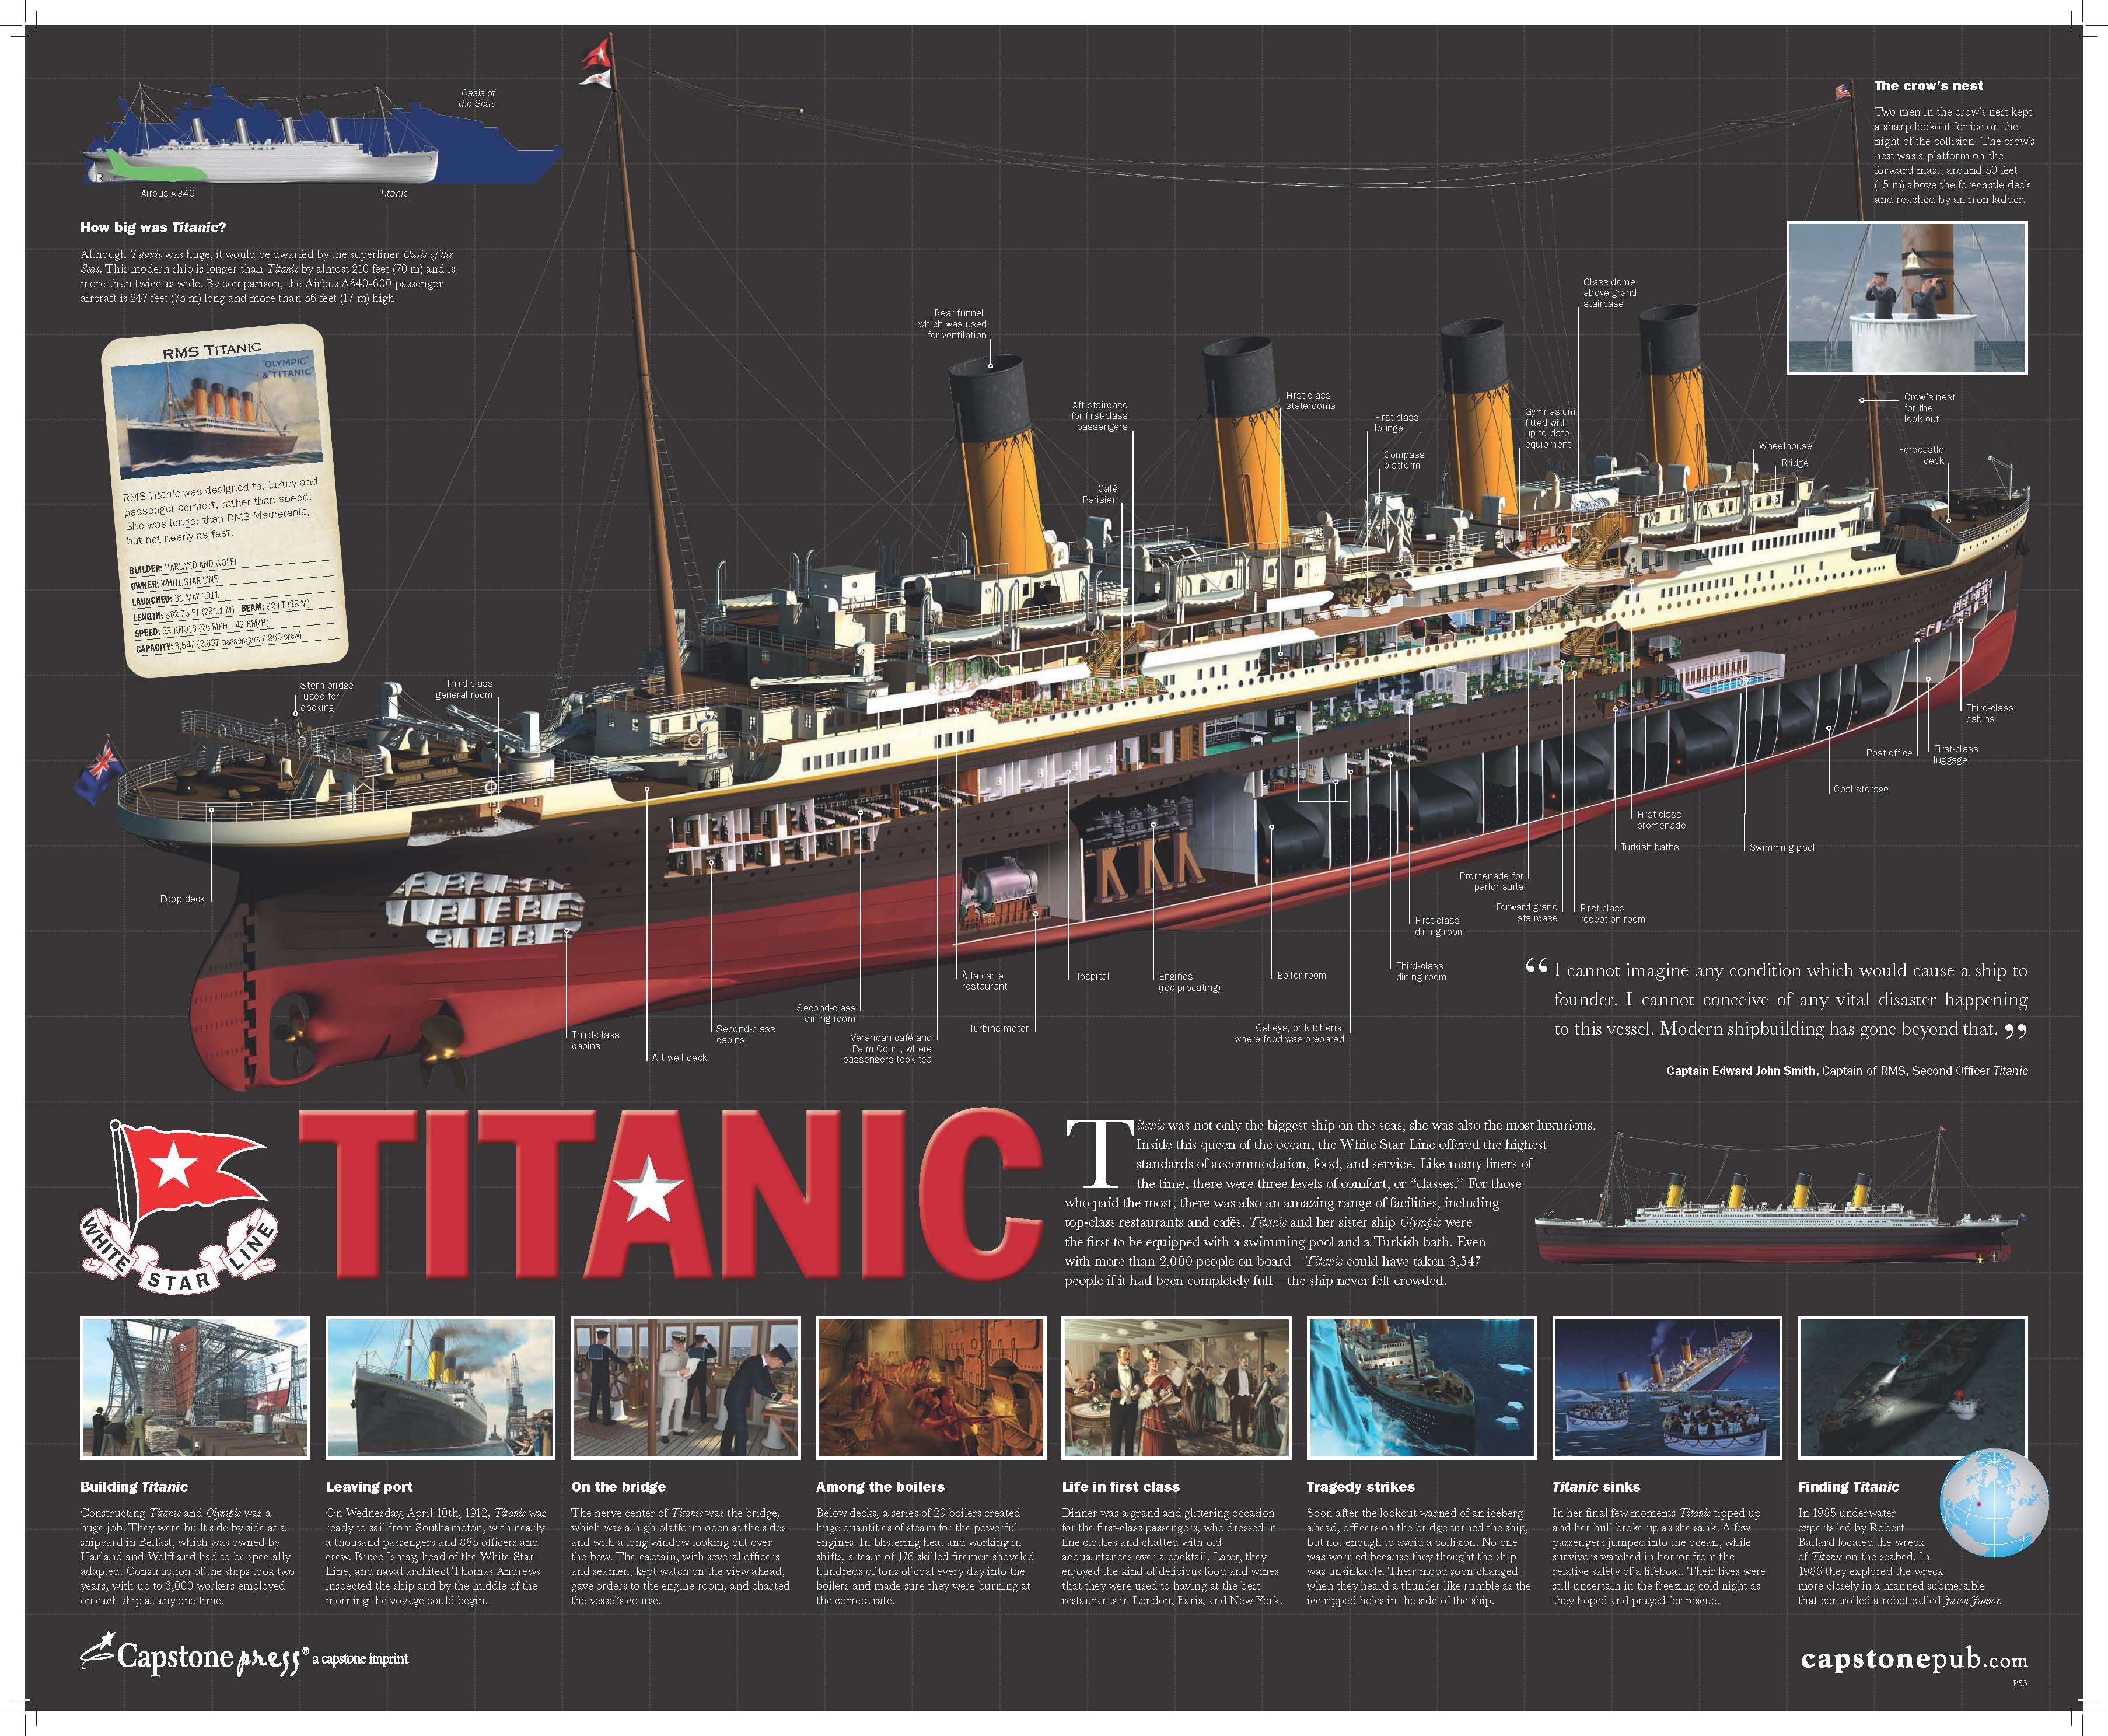 Titanic Interest In The Titanic Capstone Connect